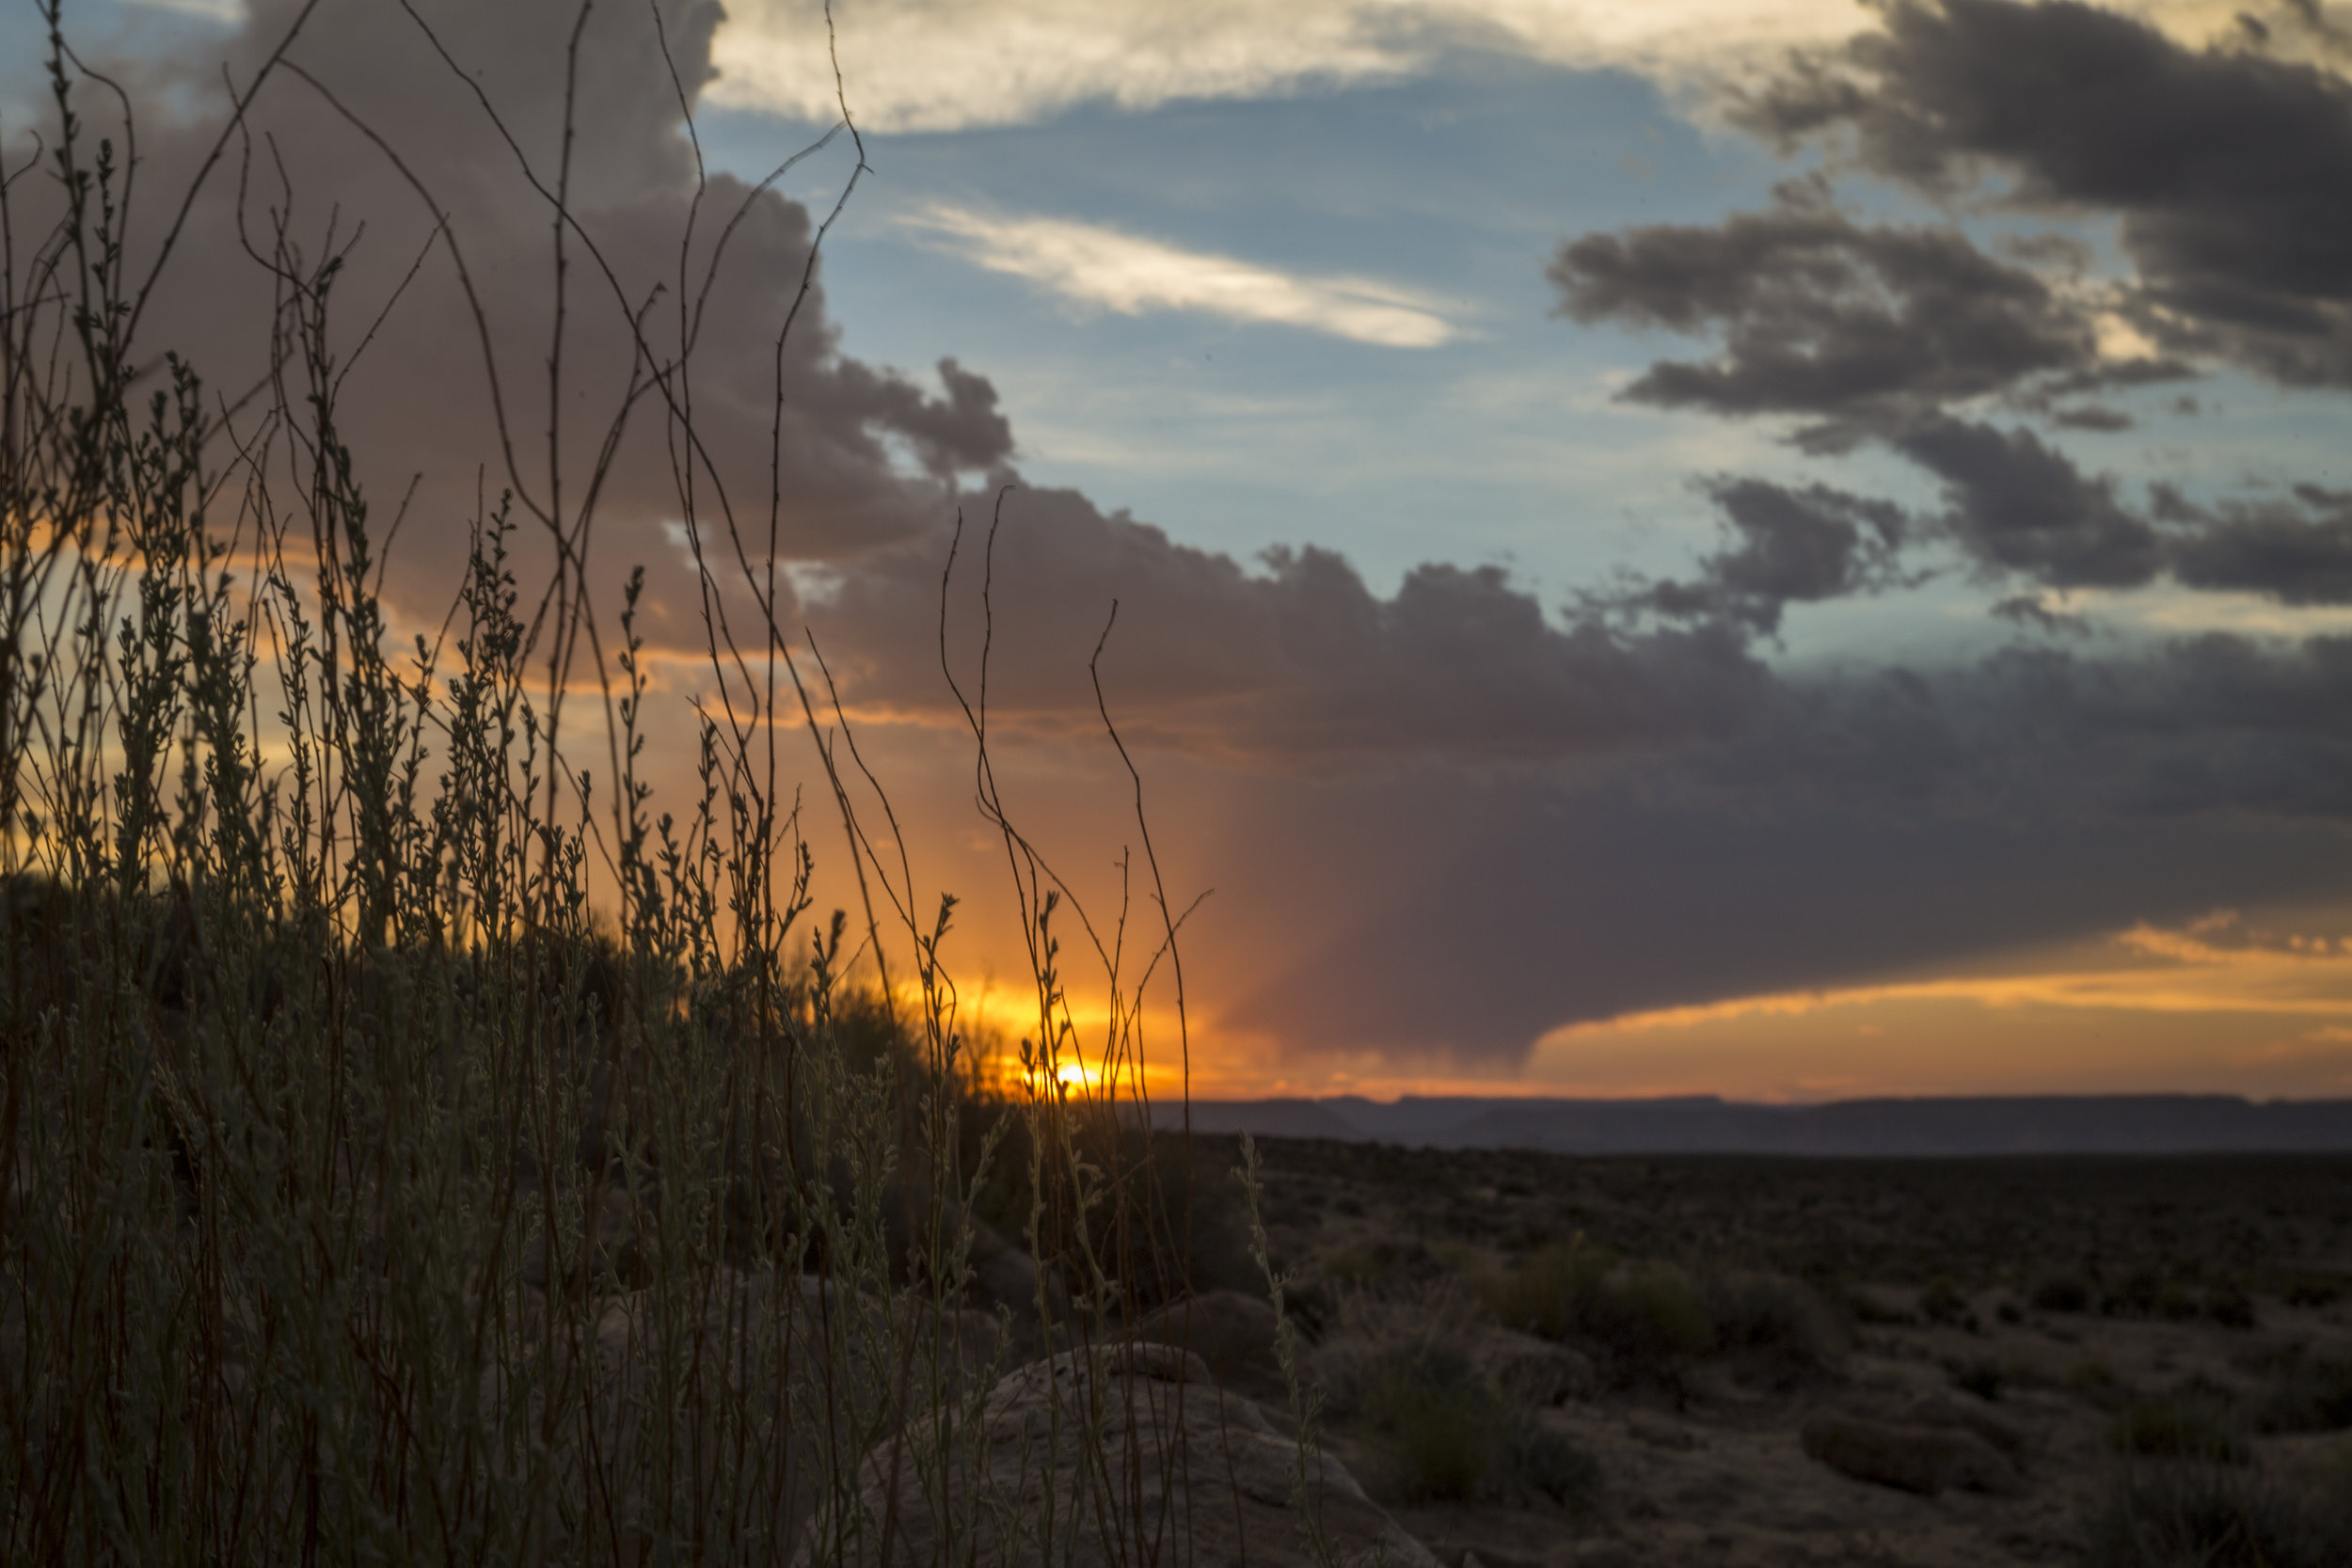 Sunset - Glen Canyon